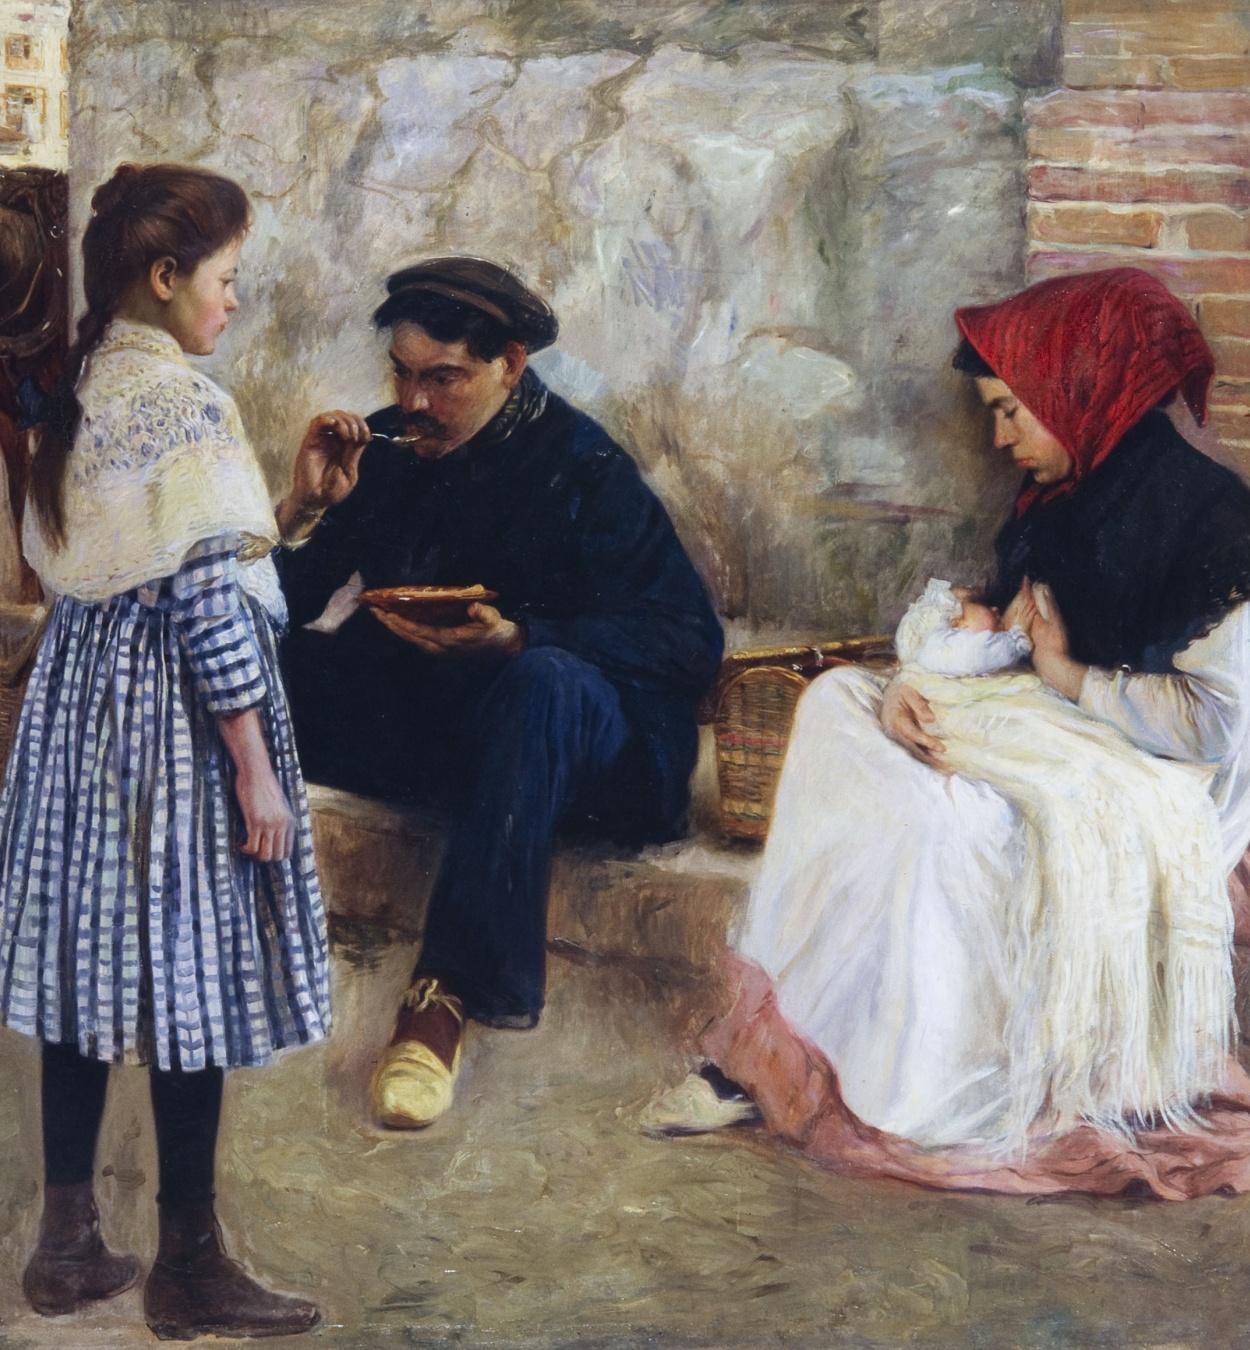 Francesc Sardà - The Worker's Dinner - 1911